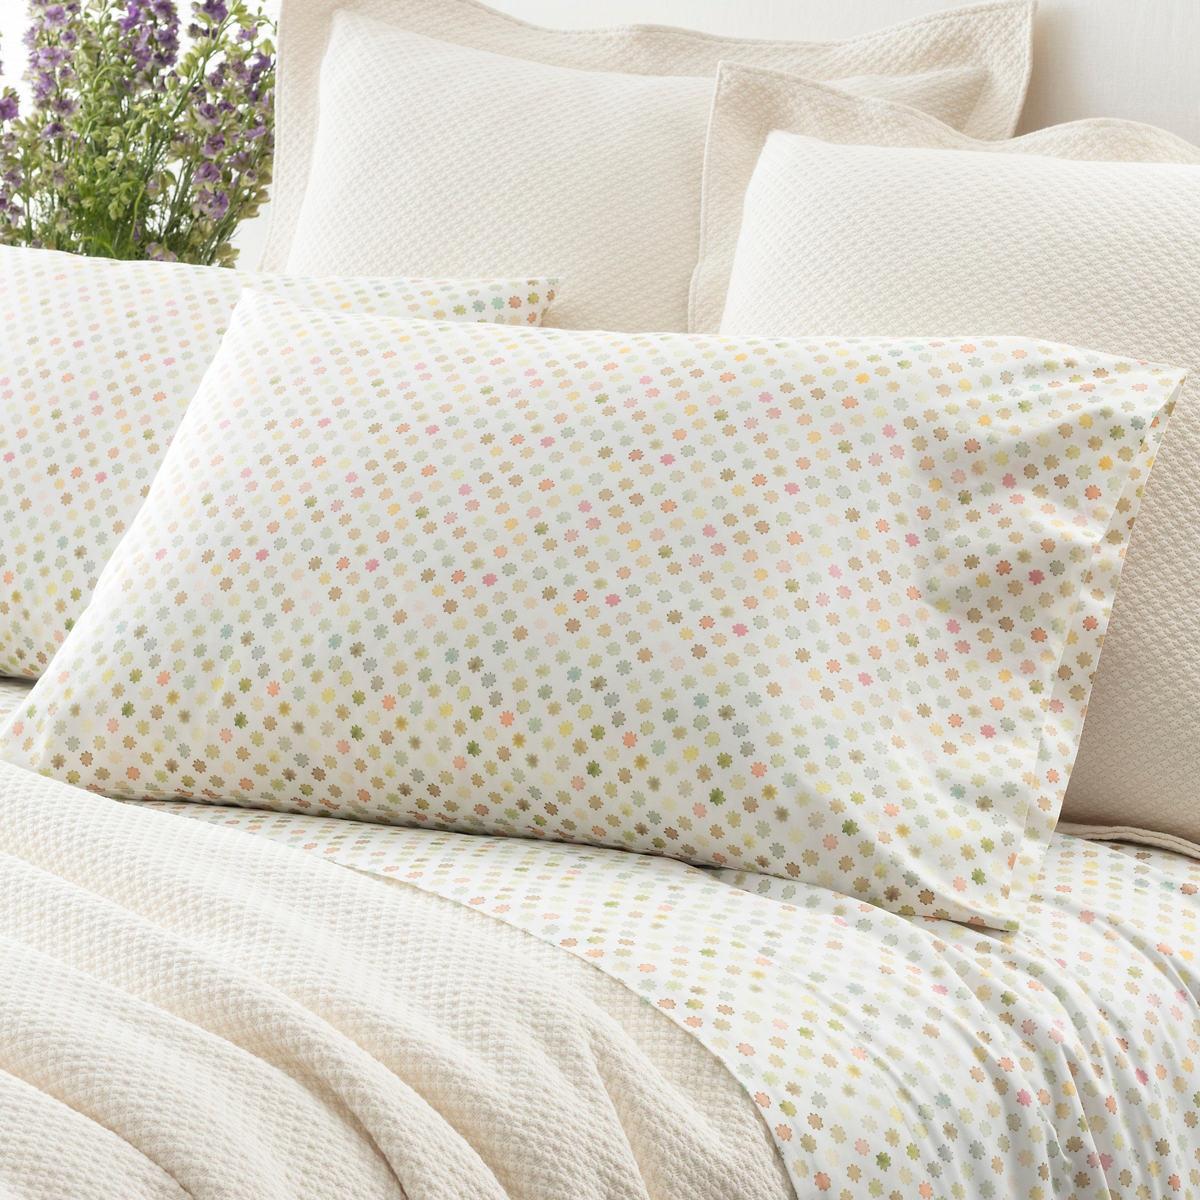 Watercolor Dots Pillowcases (Pair)